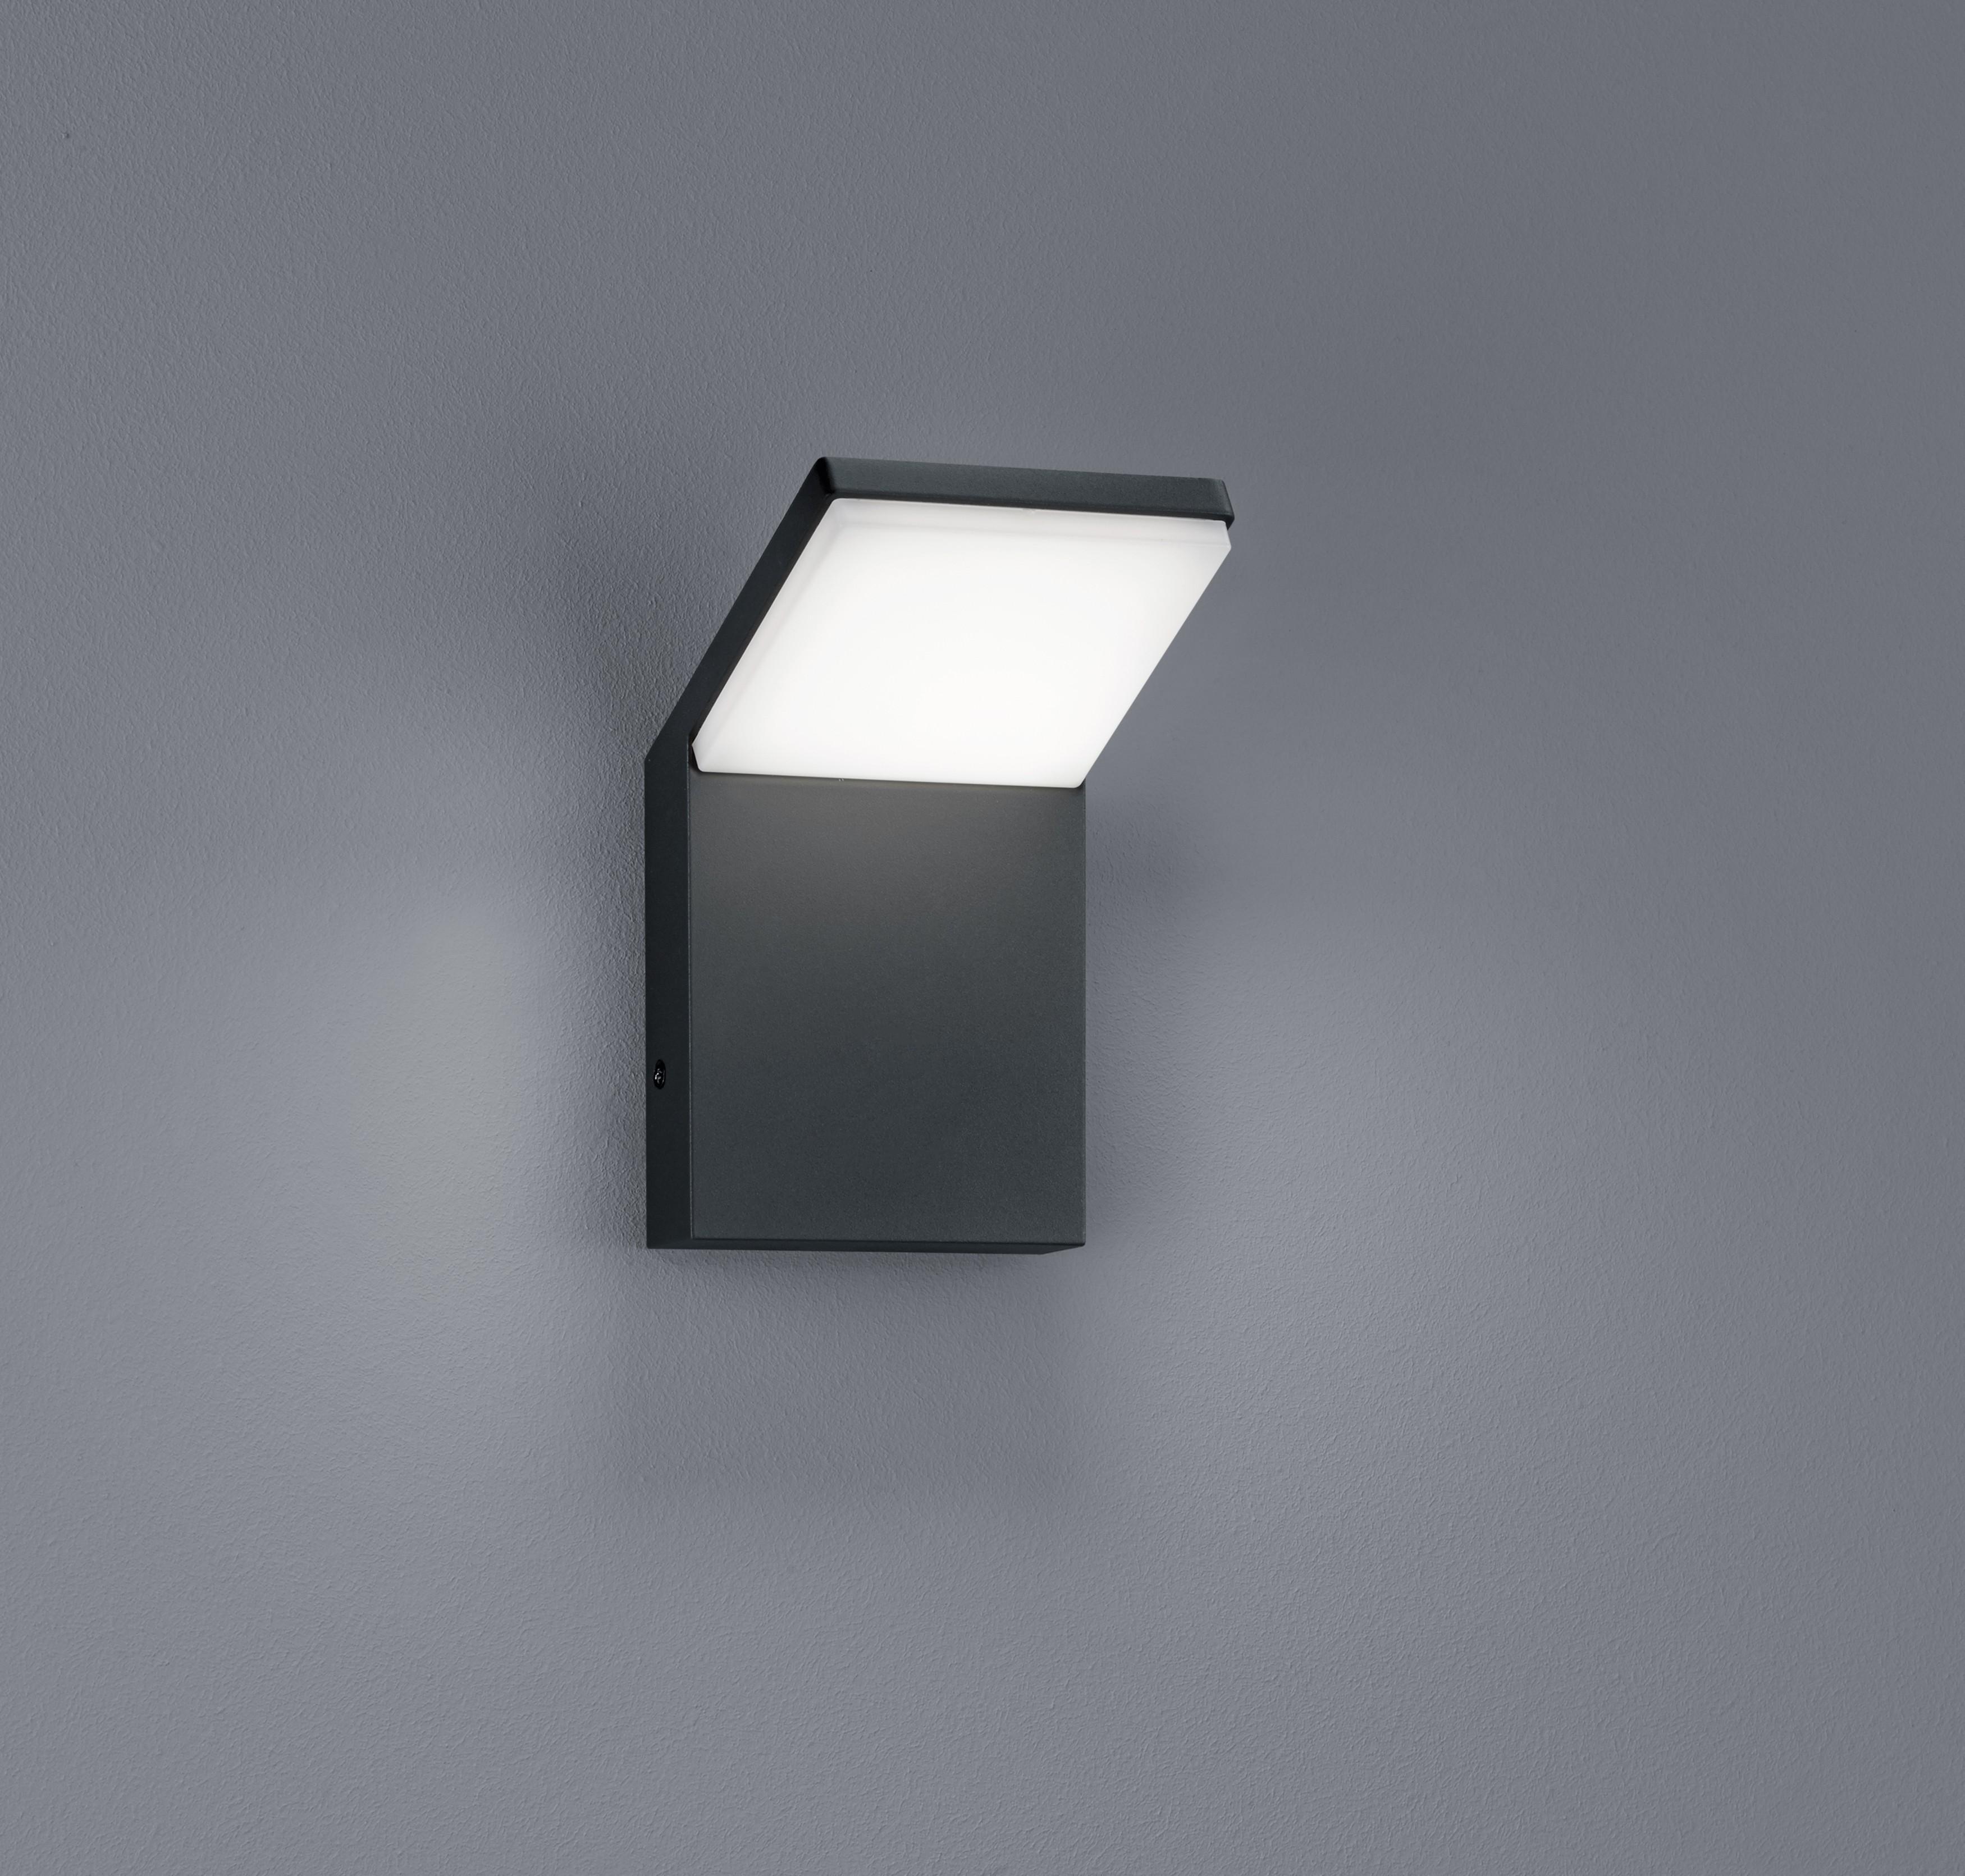 trio leuchten led aussen pollerleuchte pearl aluminiumguss. Black Bedroom Furniture Sets. Home Design Ideas